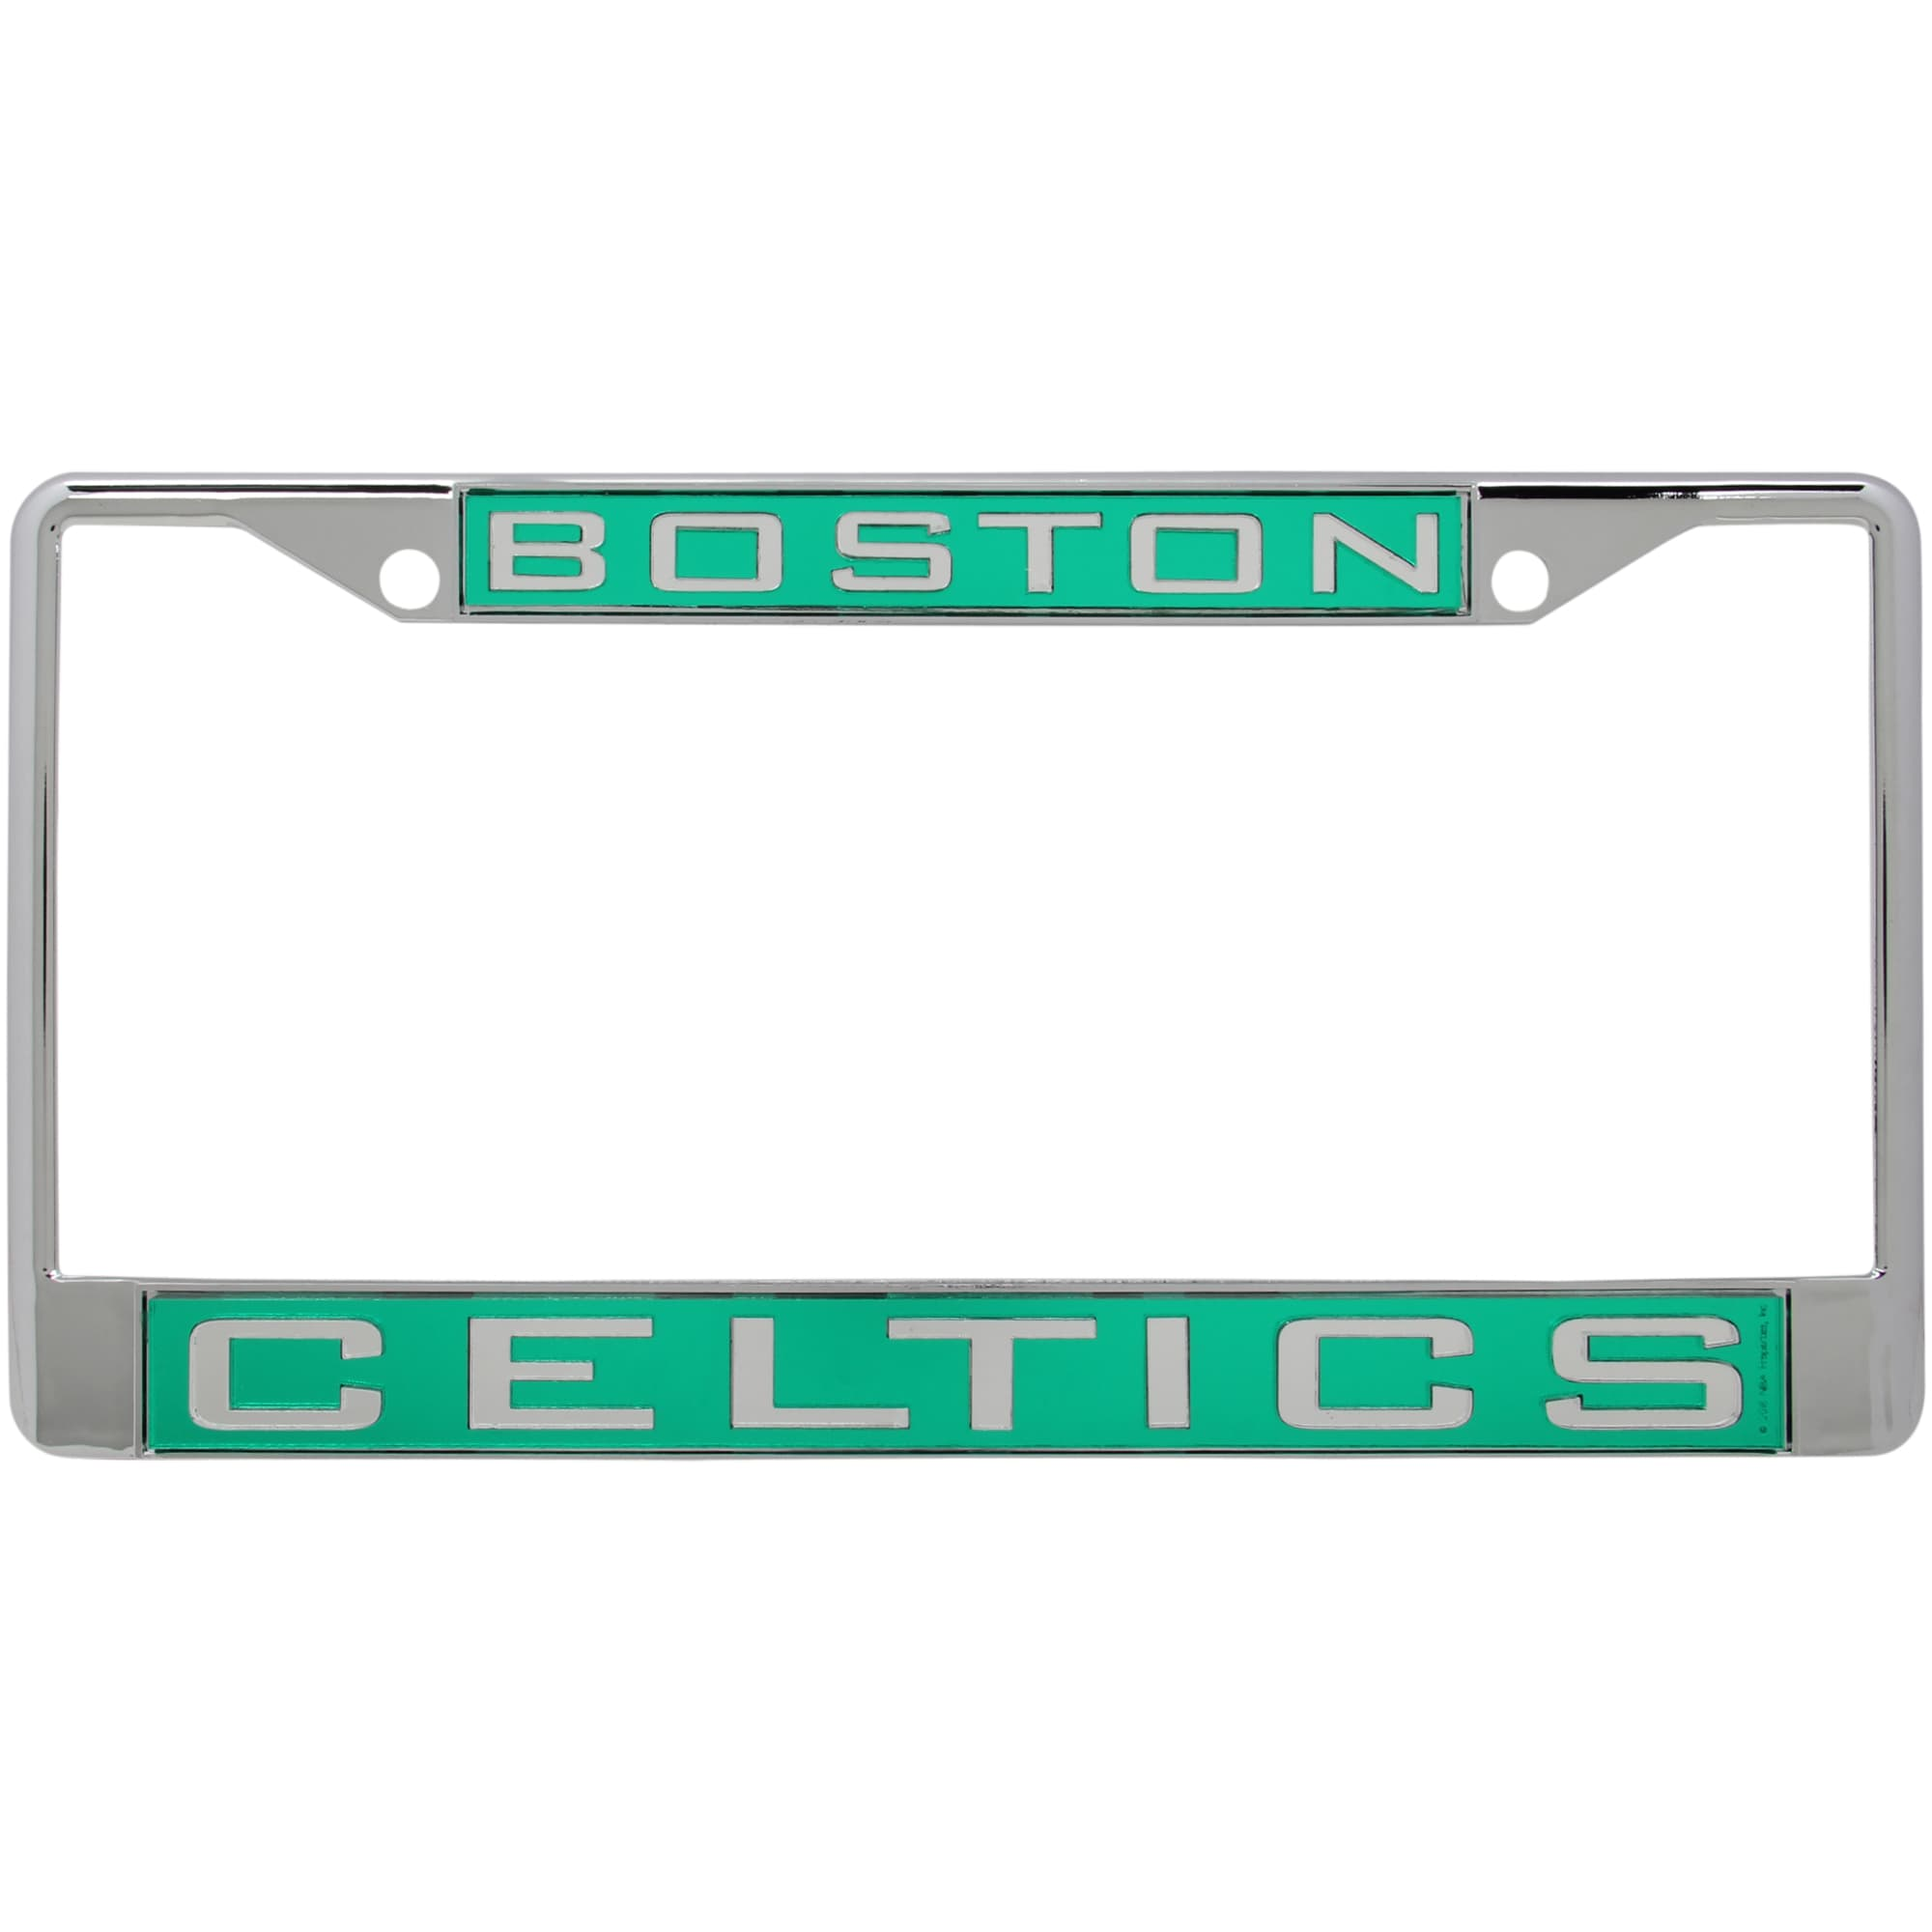 Boston Celtics WinCraft Laser Inlaid Metal License Plate Frame